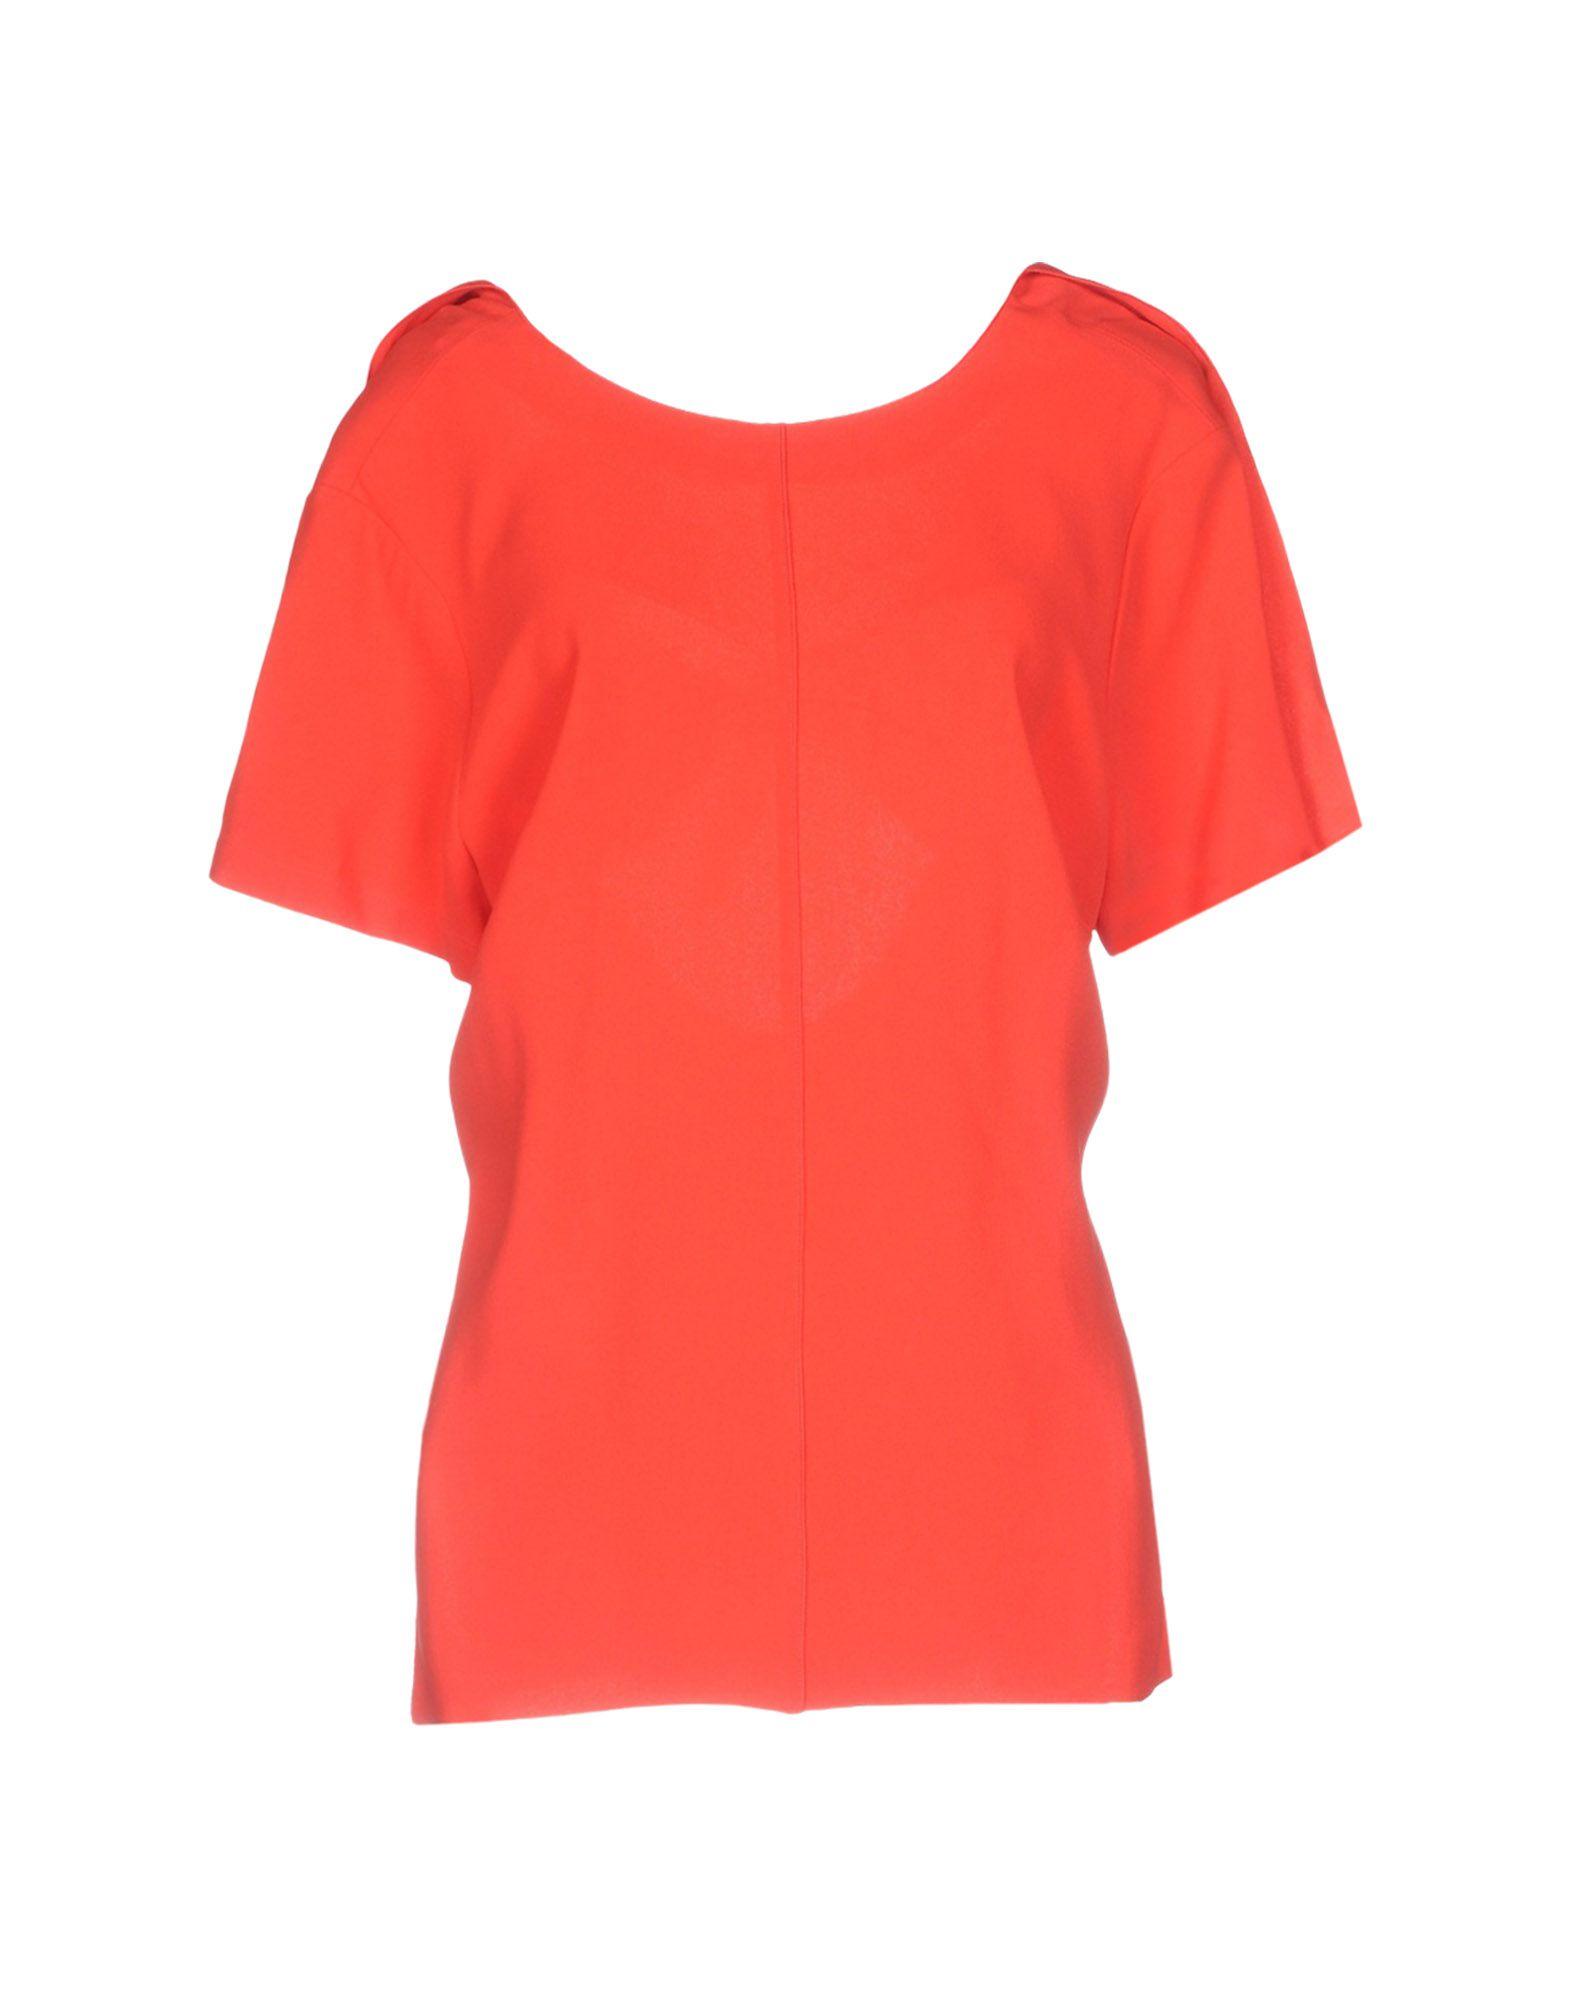 Camicie E Bluse Tinta Unita Mary Katrantzou Donna - Acquista online su HnHtHiM